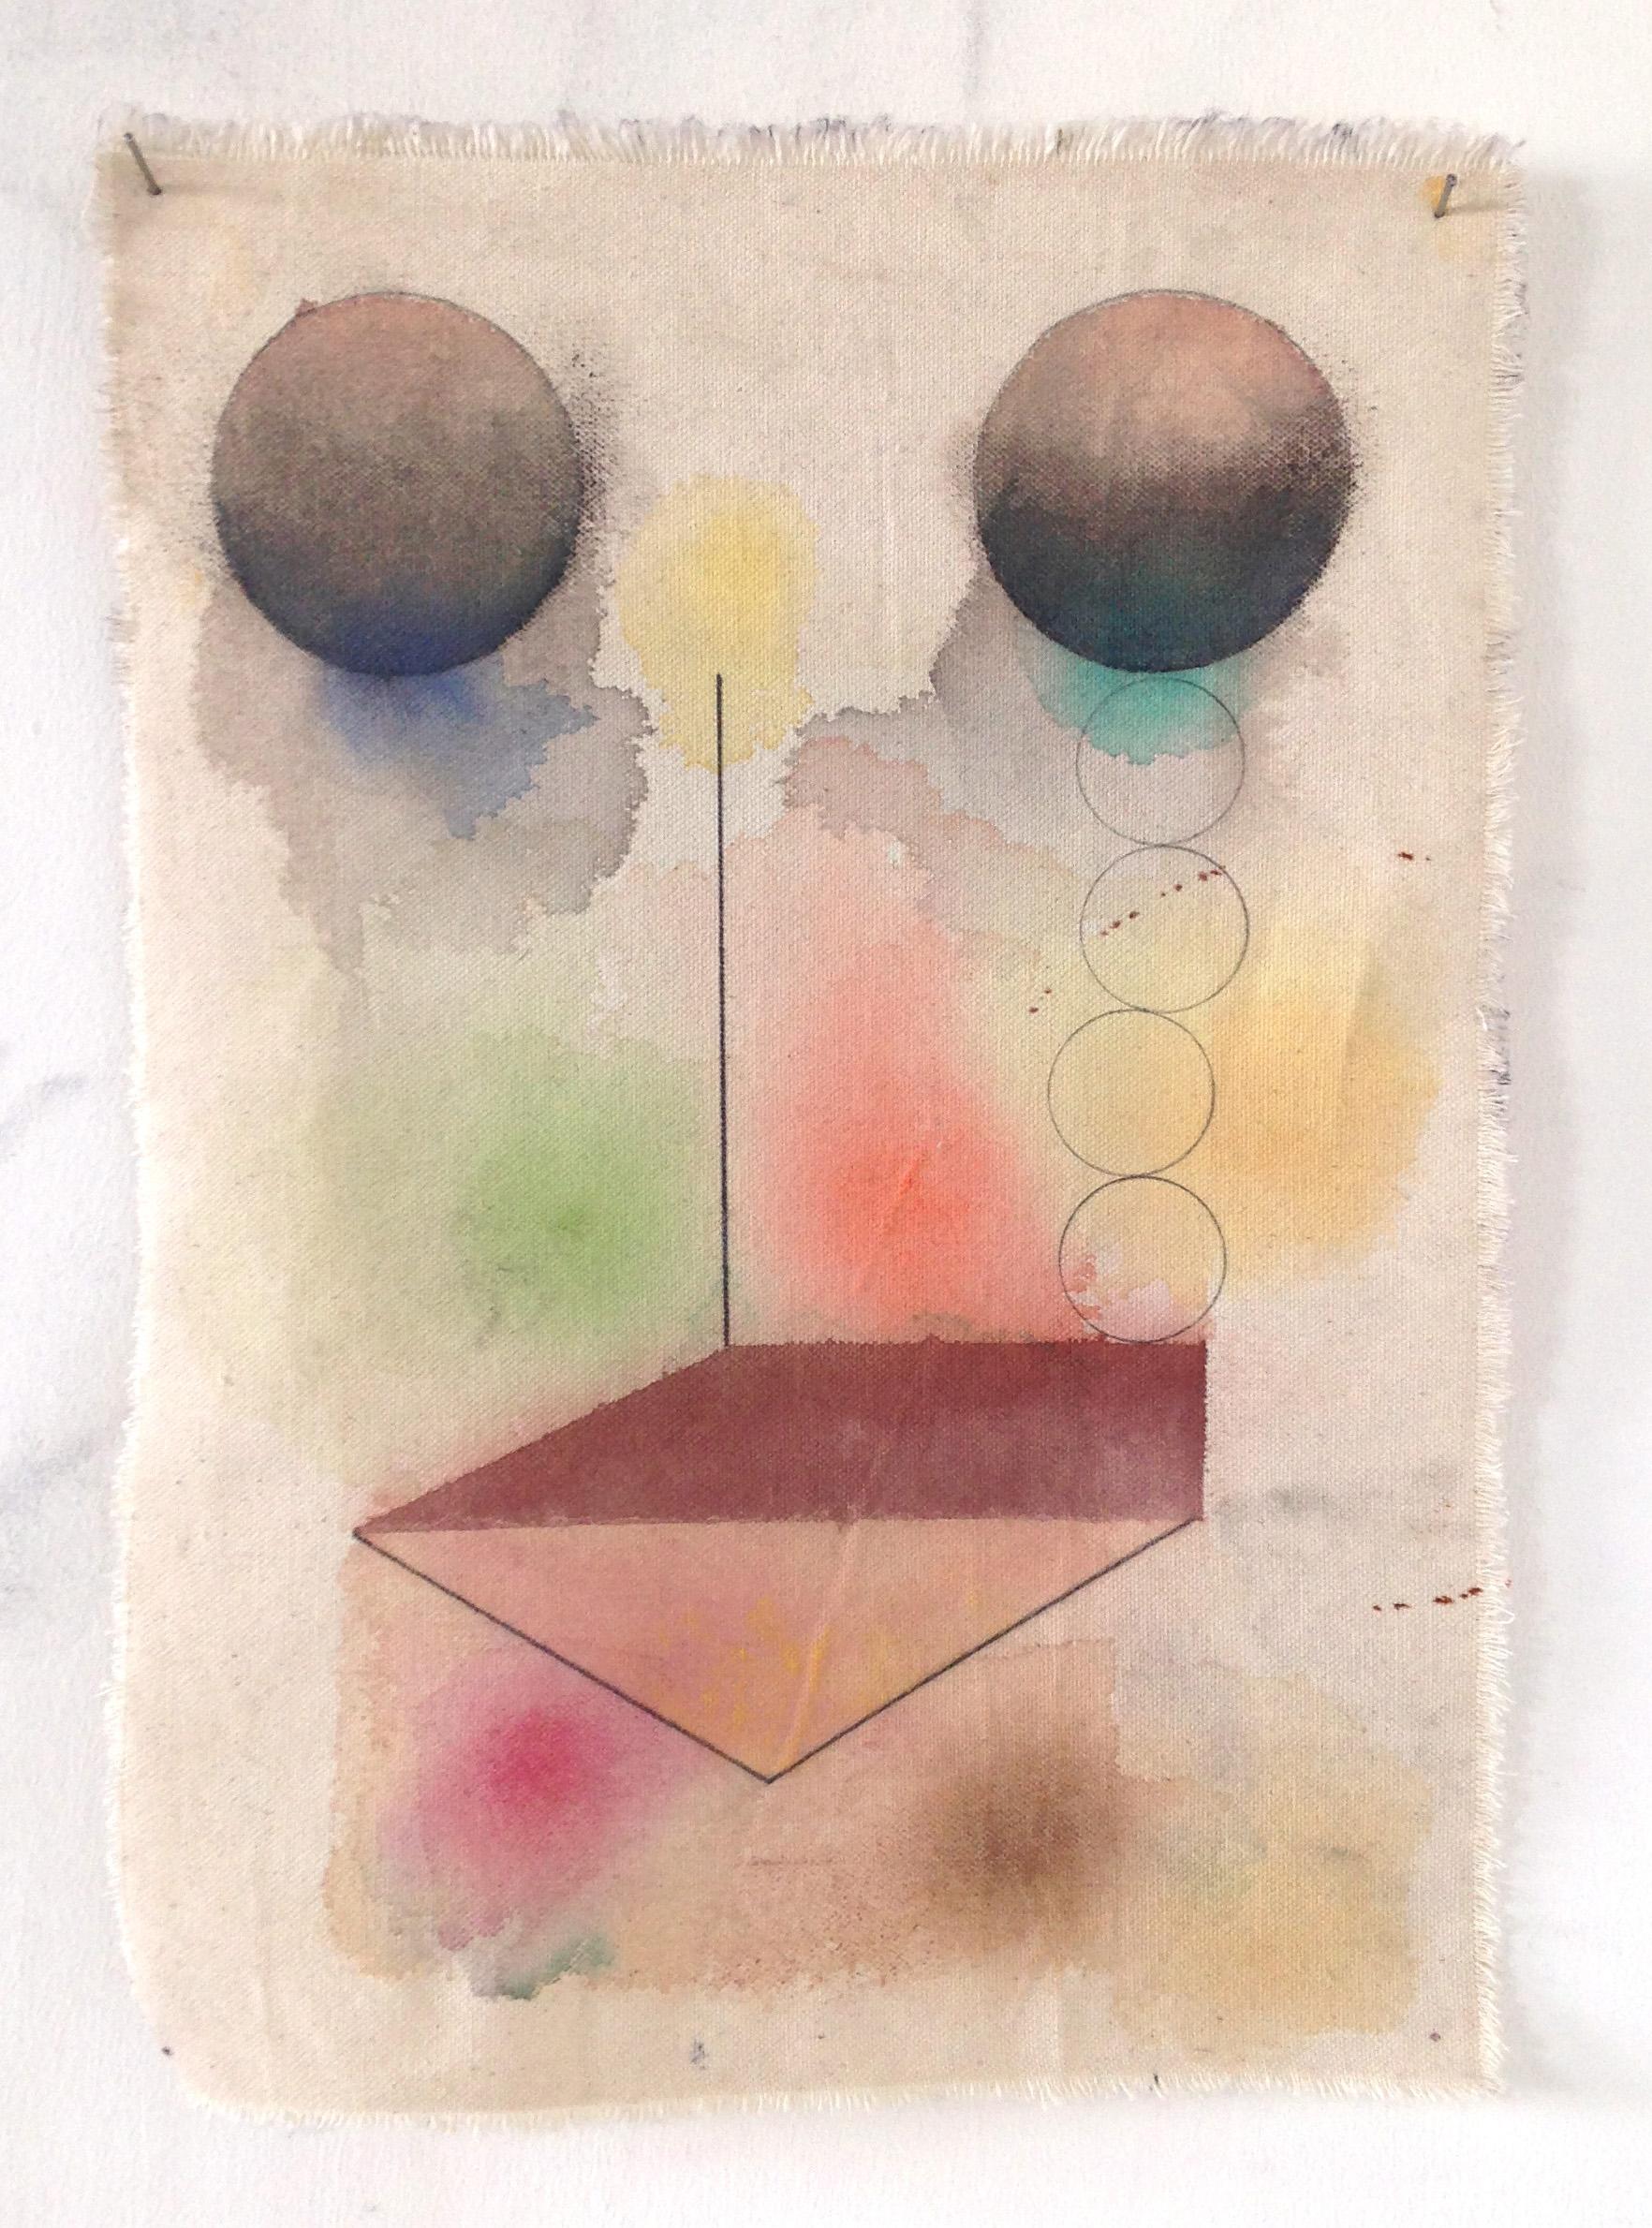 On Serdica, 2015 Pencil, gouache, pastel and canvas,39.5 x 28.5 cm